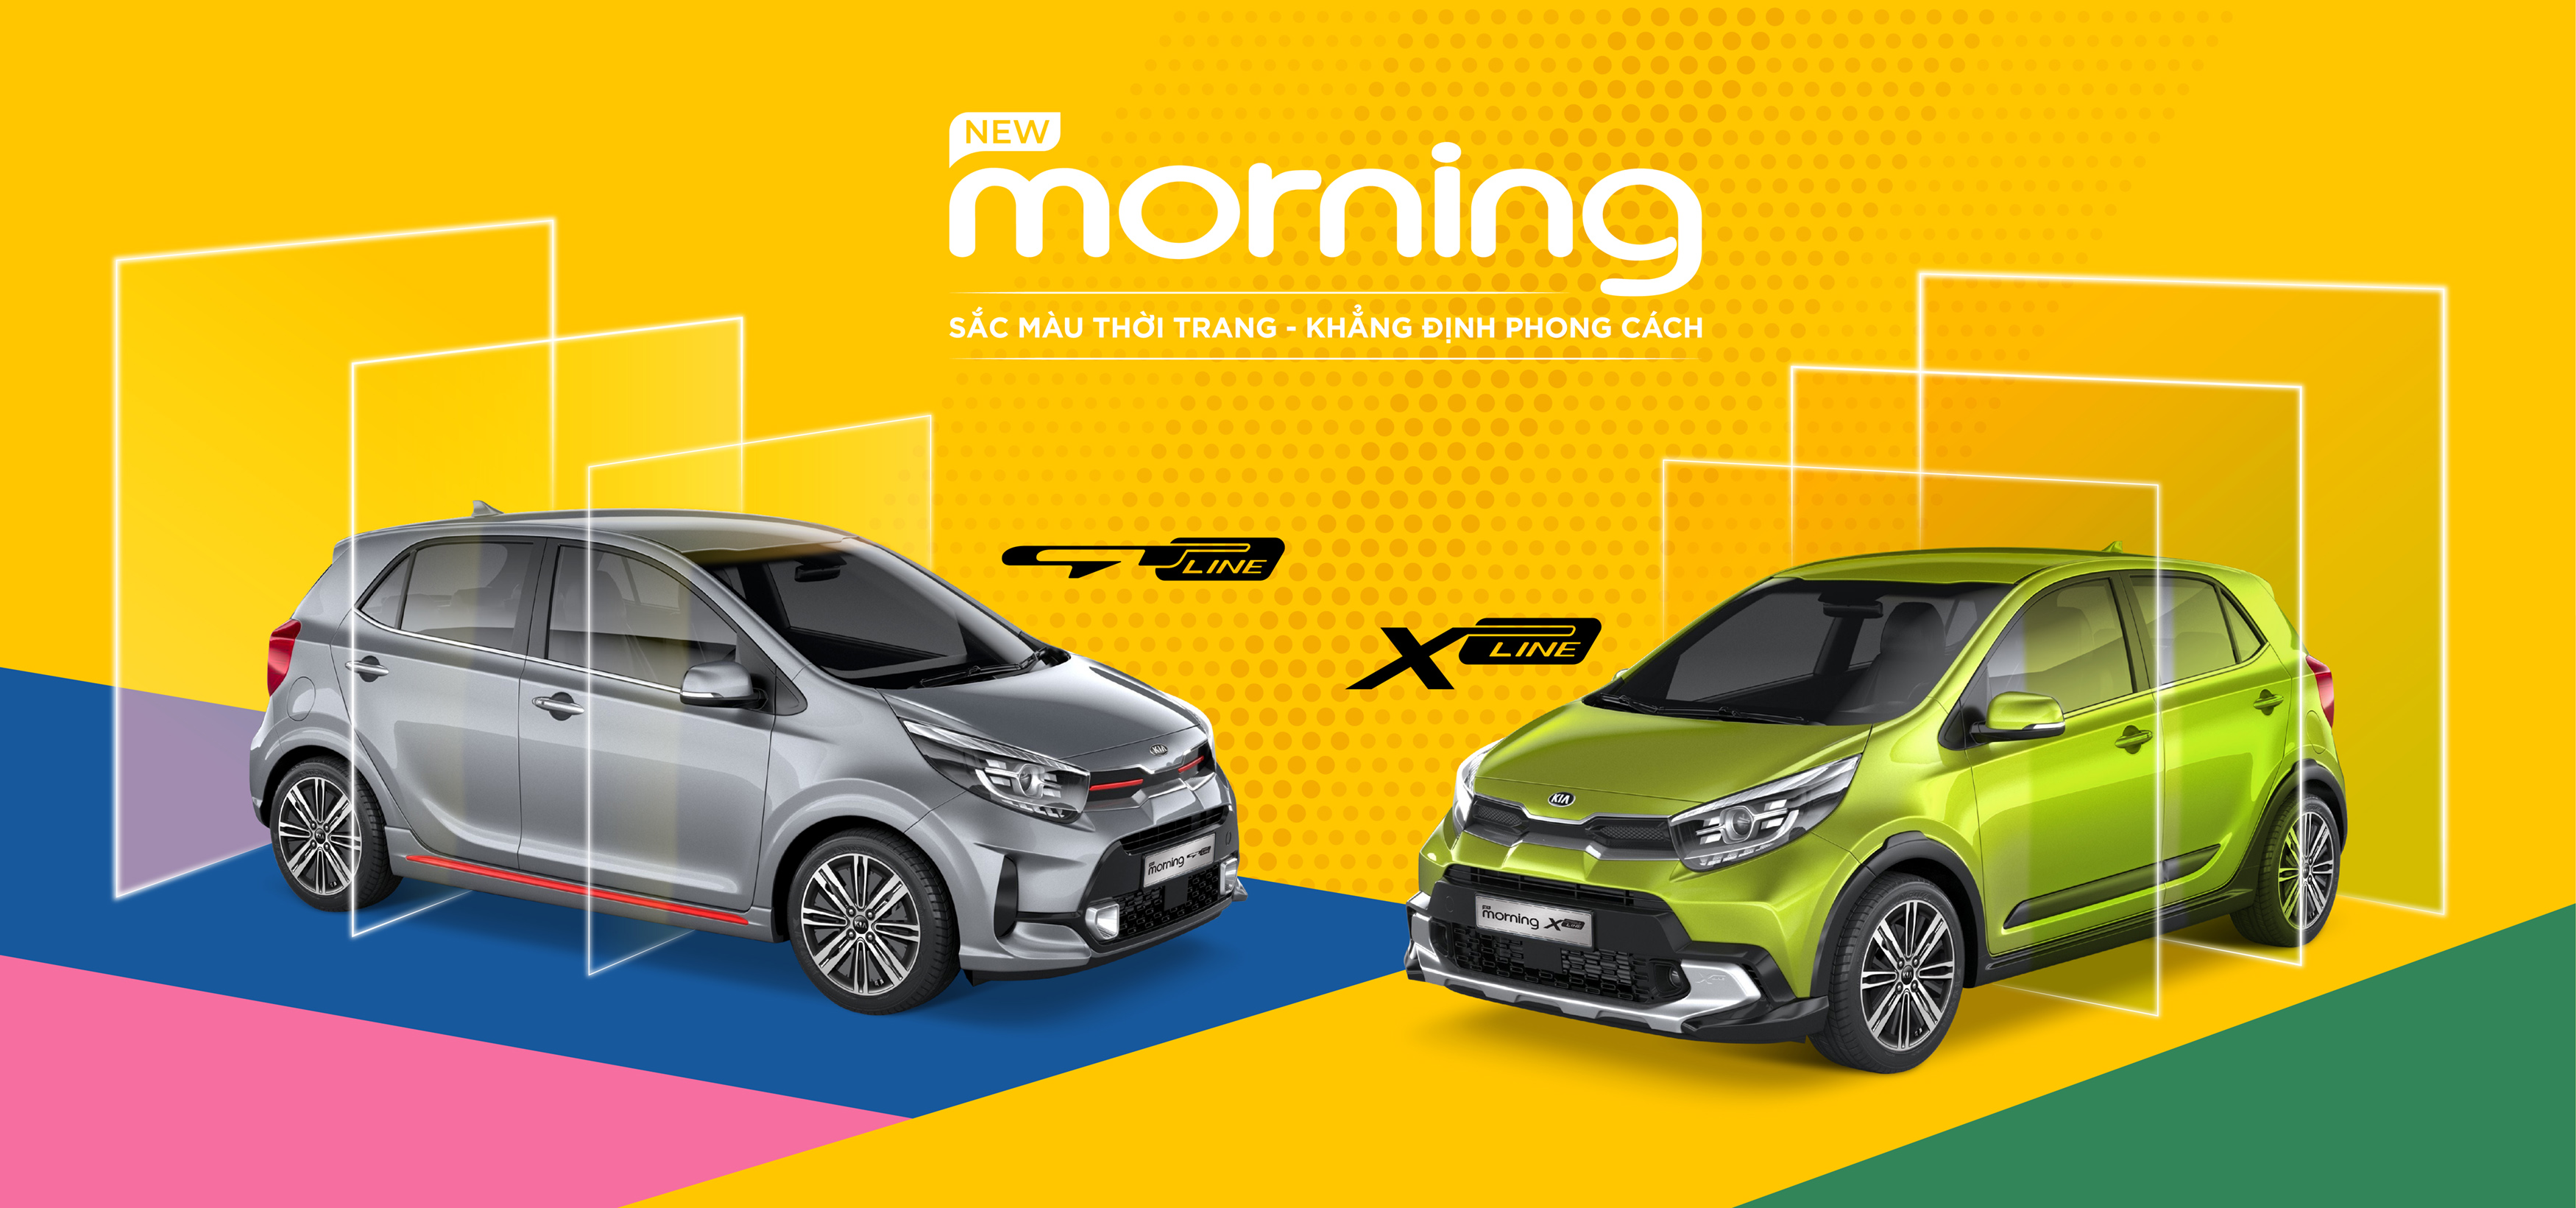 Thaco Giới Thiệu New Morning GT-Line & X-Line